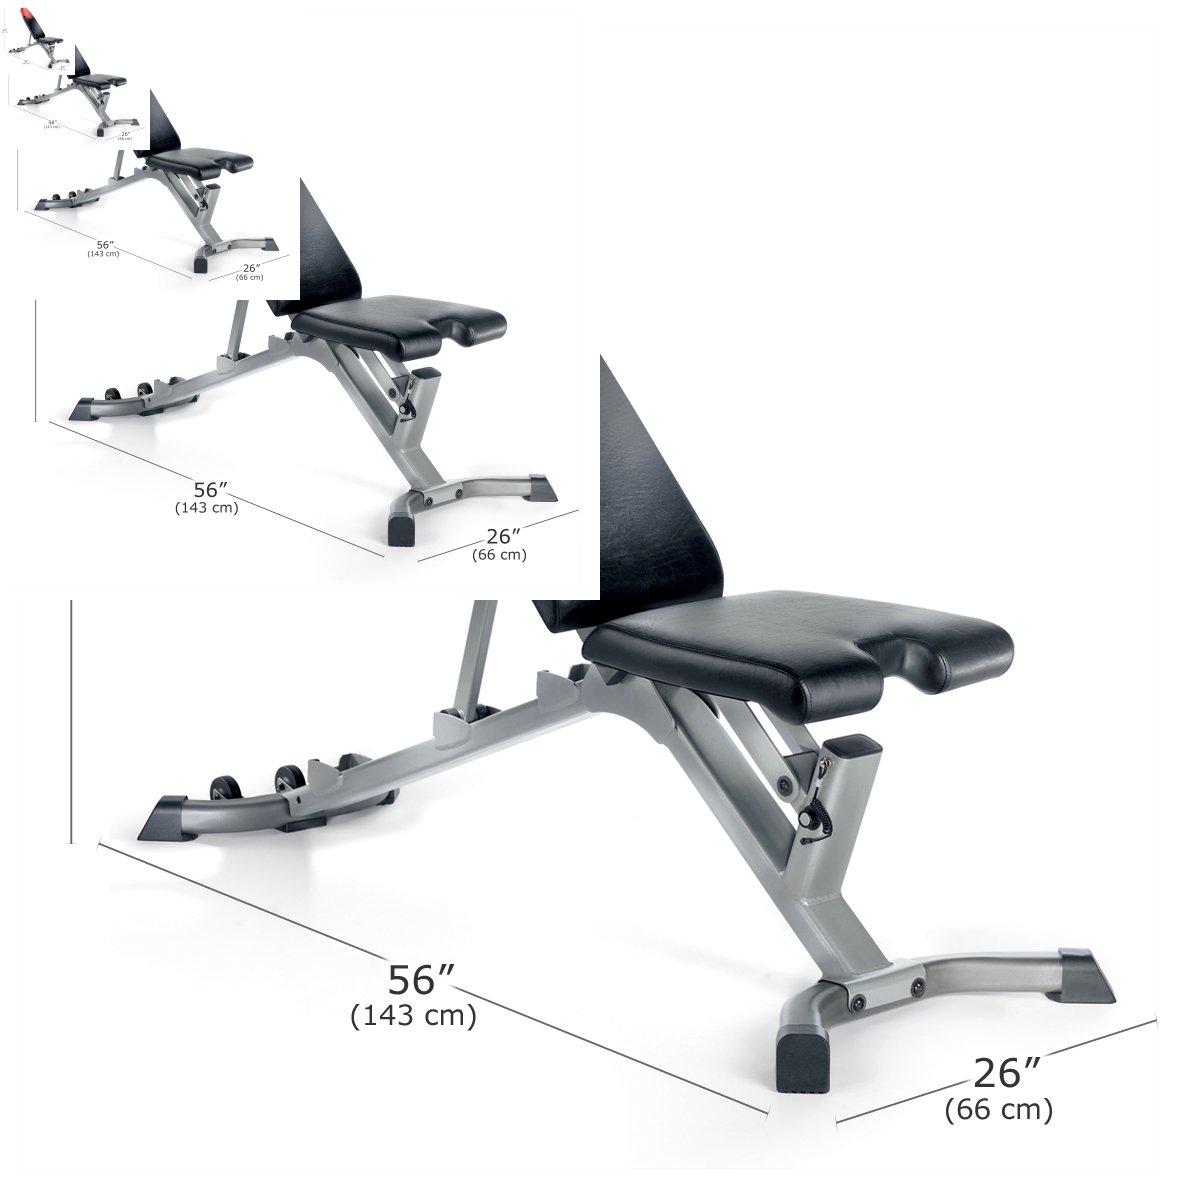 featured weight adjustable drenchfit equipment review selecttech weights bowflex bench